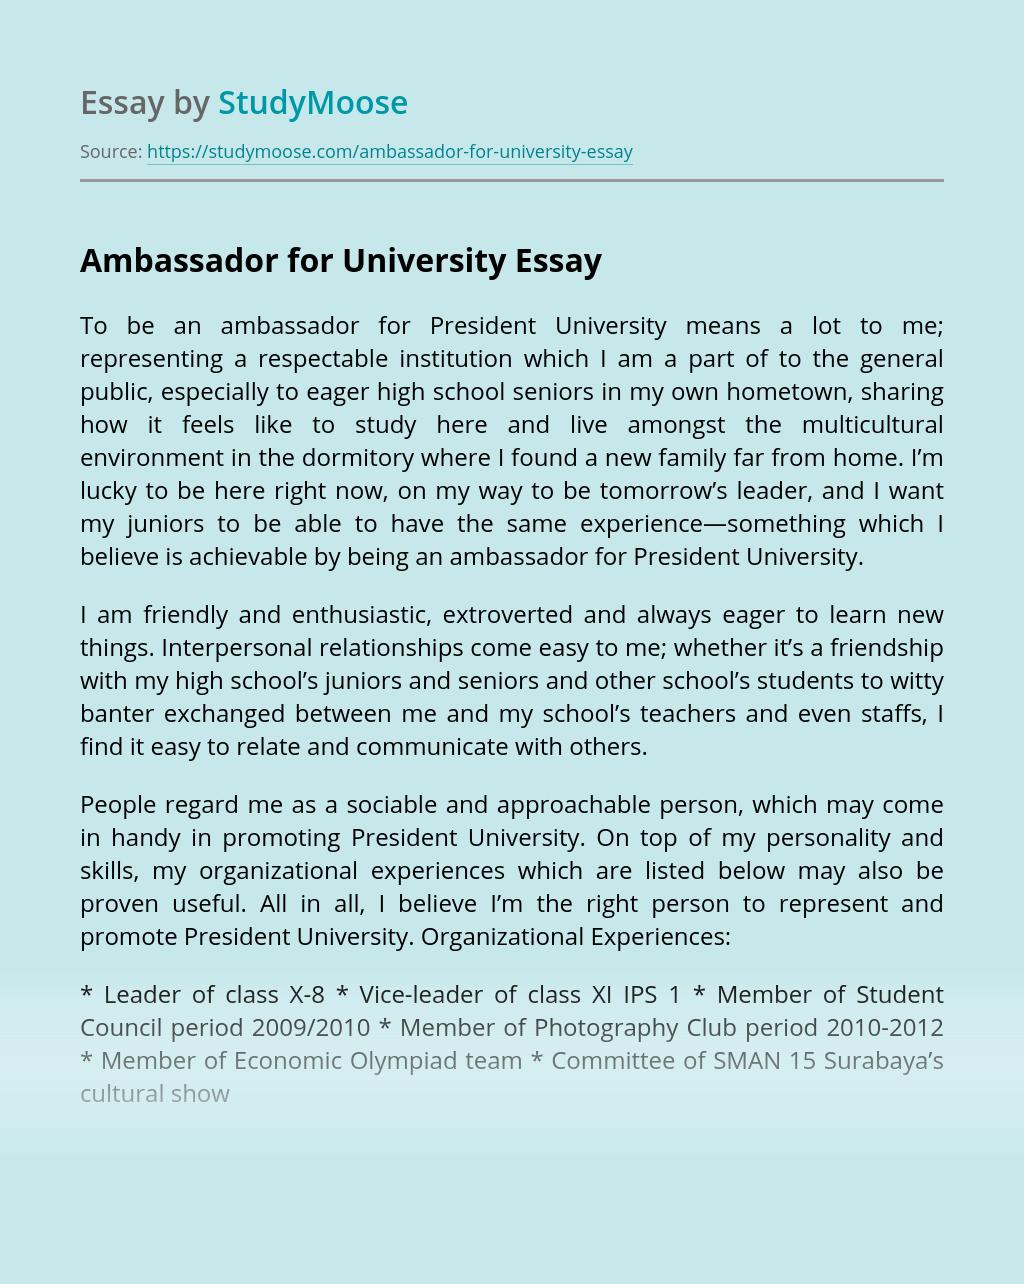 Ambassador for University